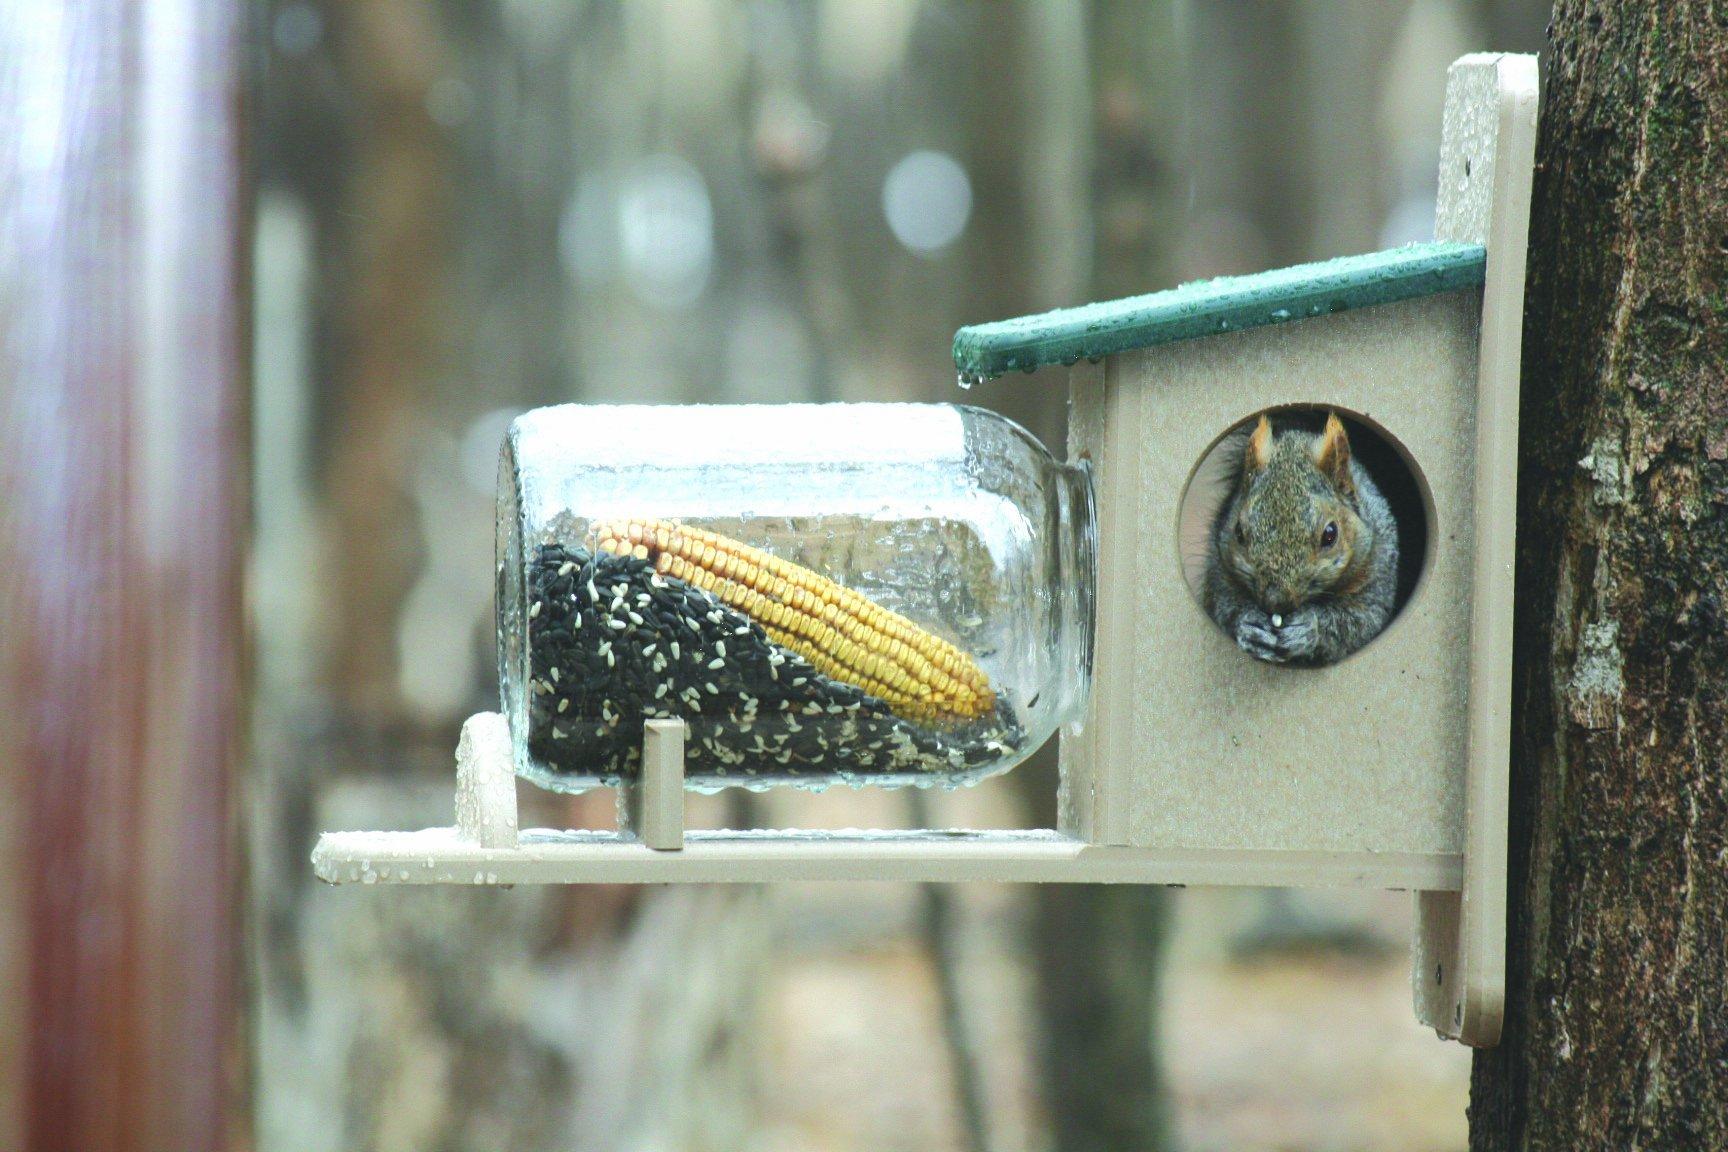 Birds Choice Squirrel Jar Feeder